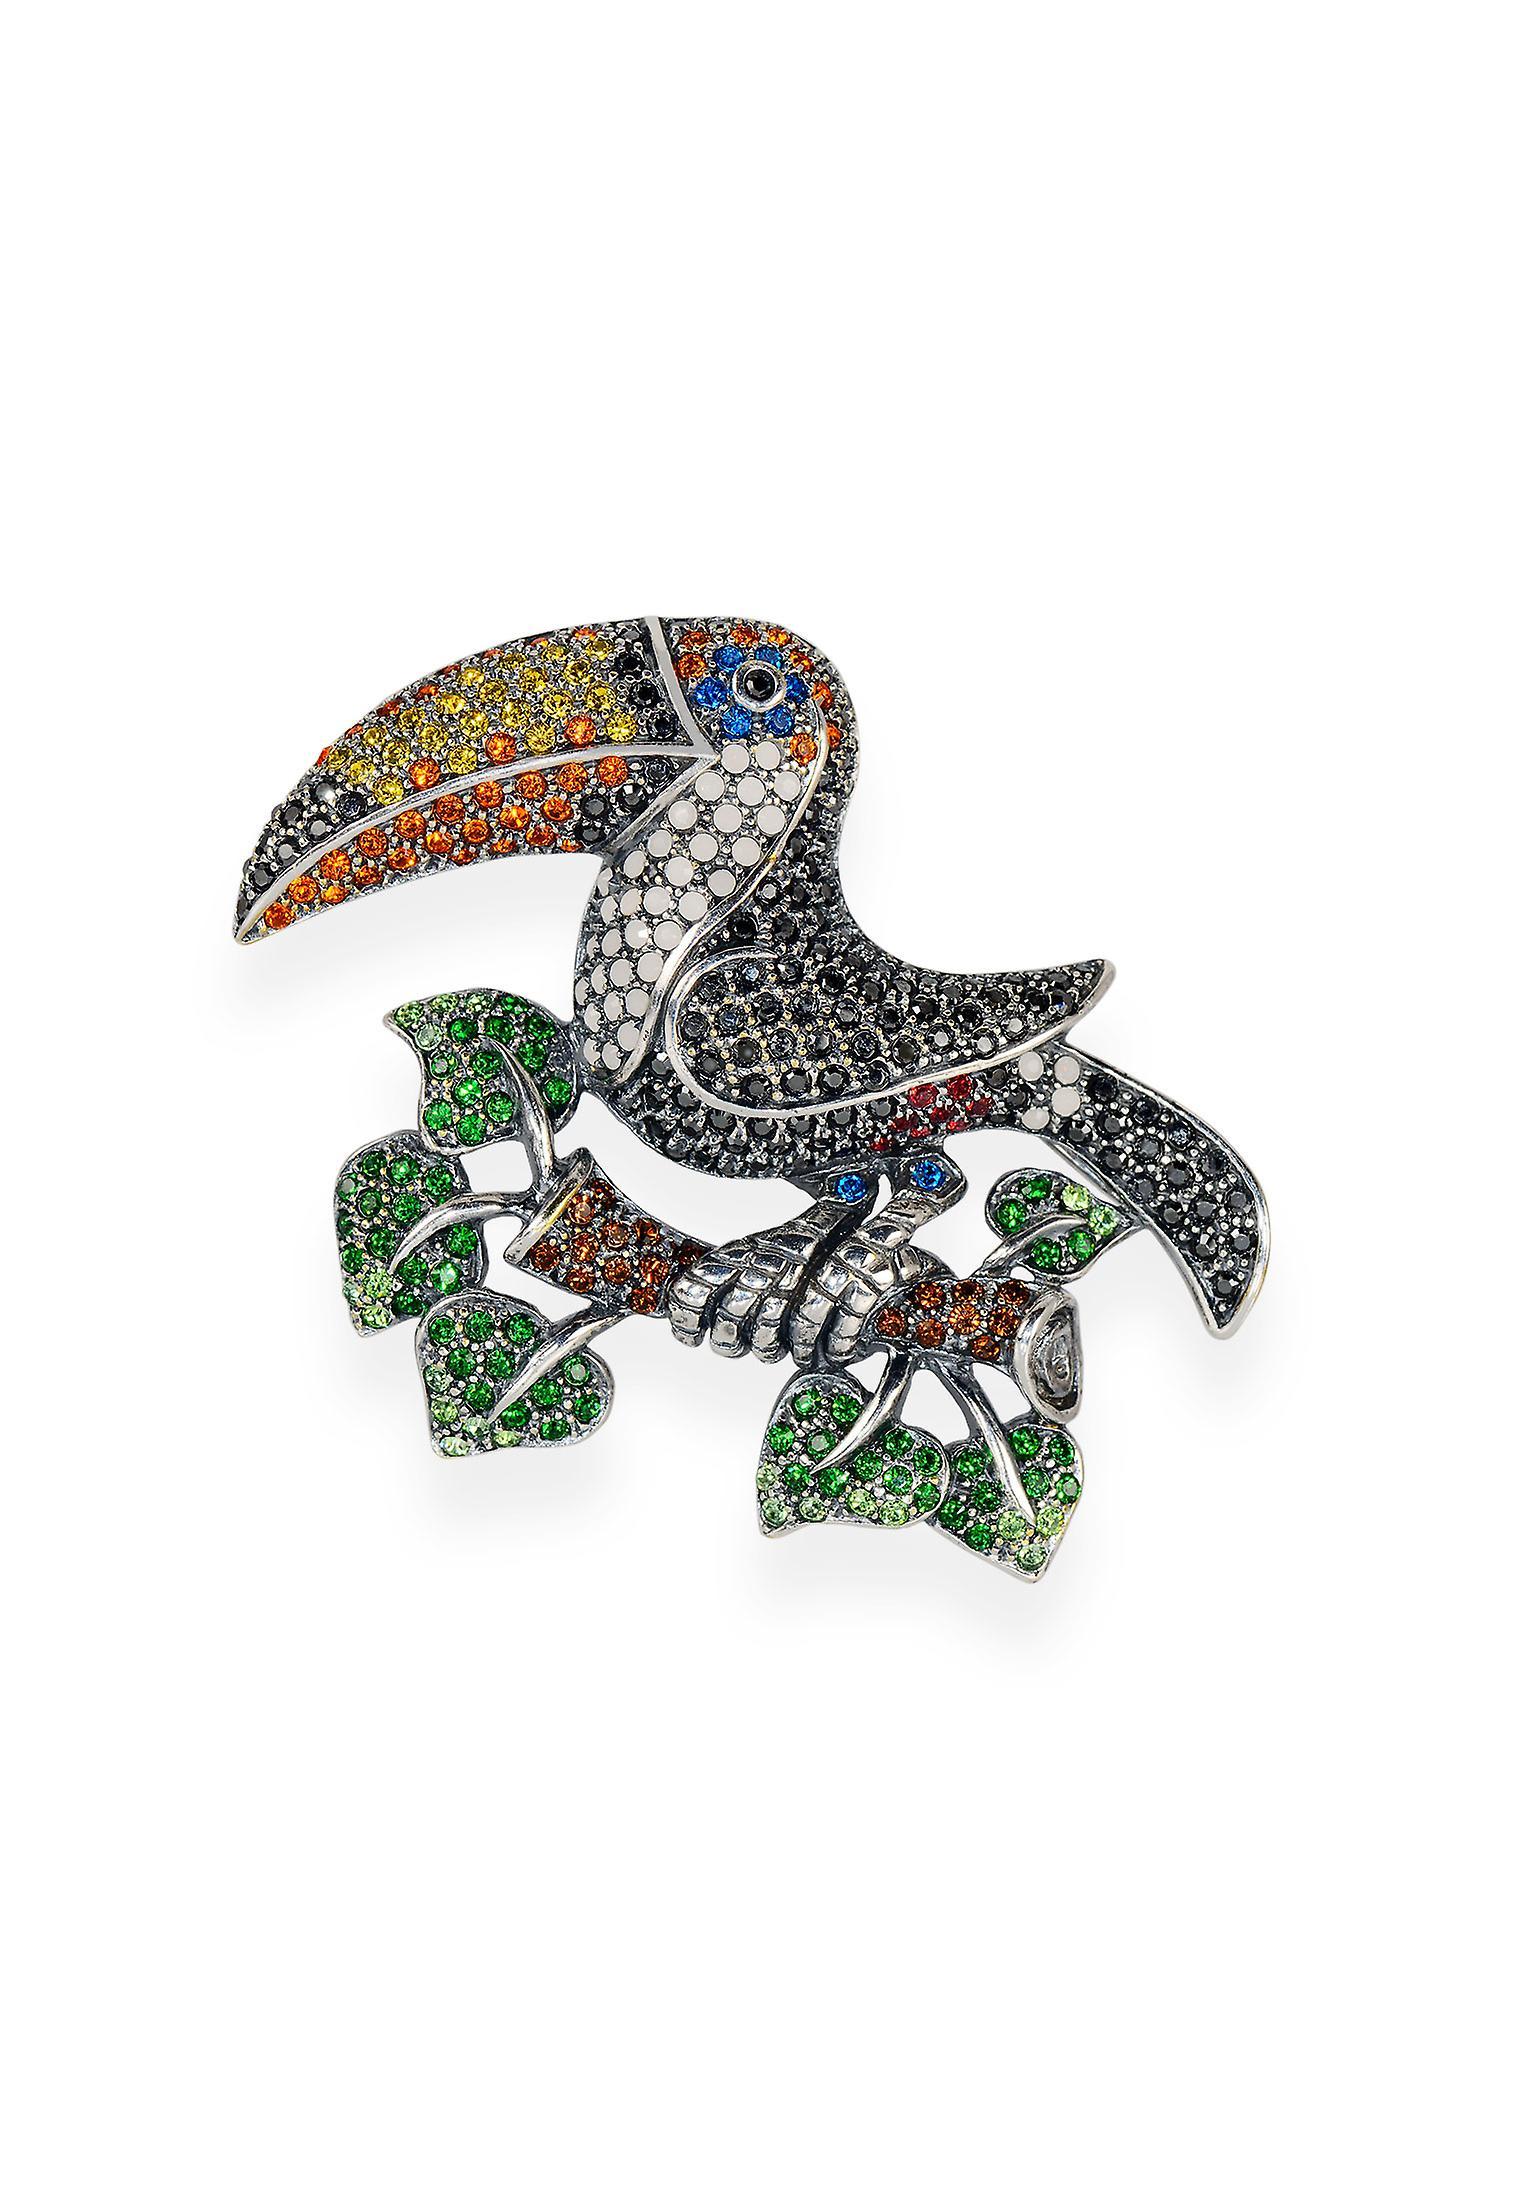 Multicolor brooch with crystals from Swarovski 7110